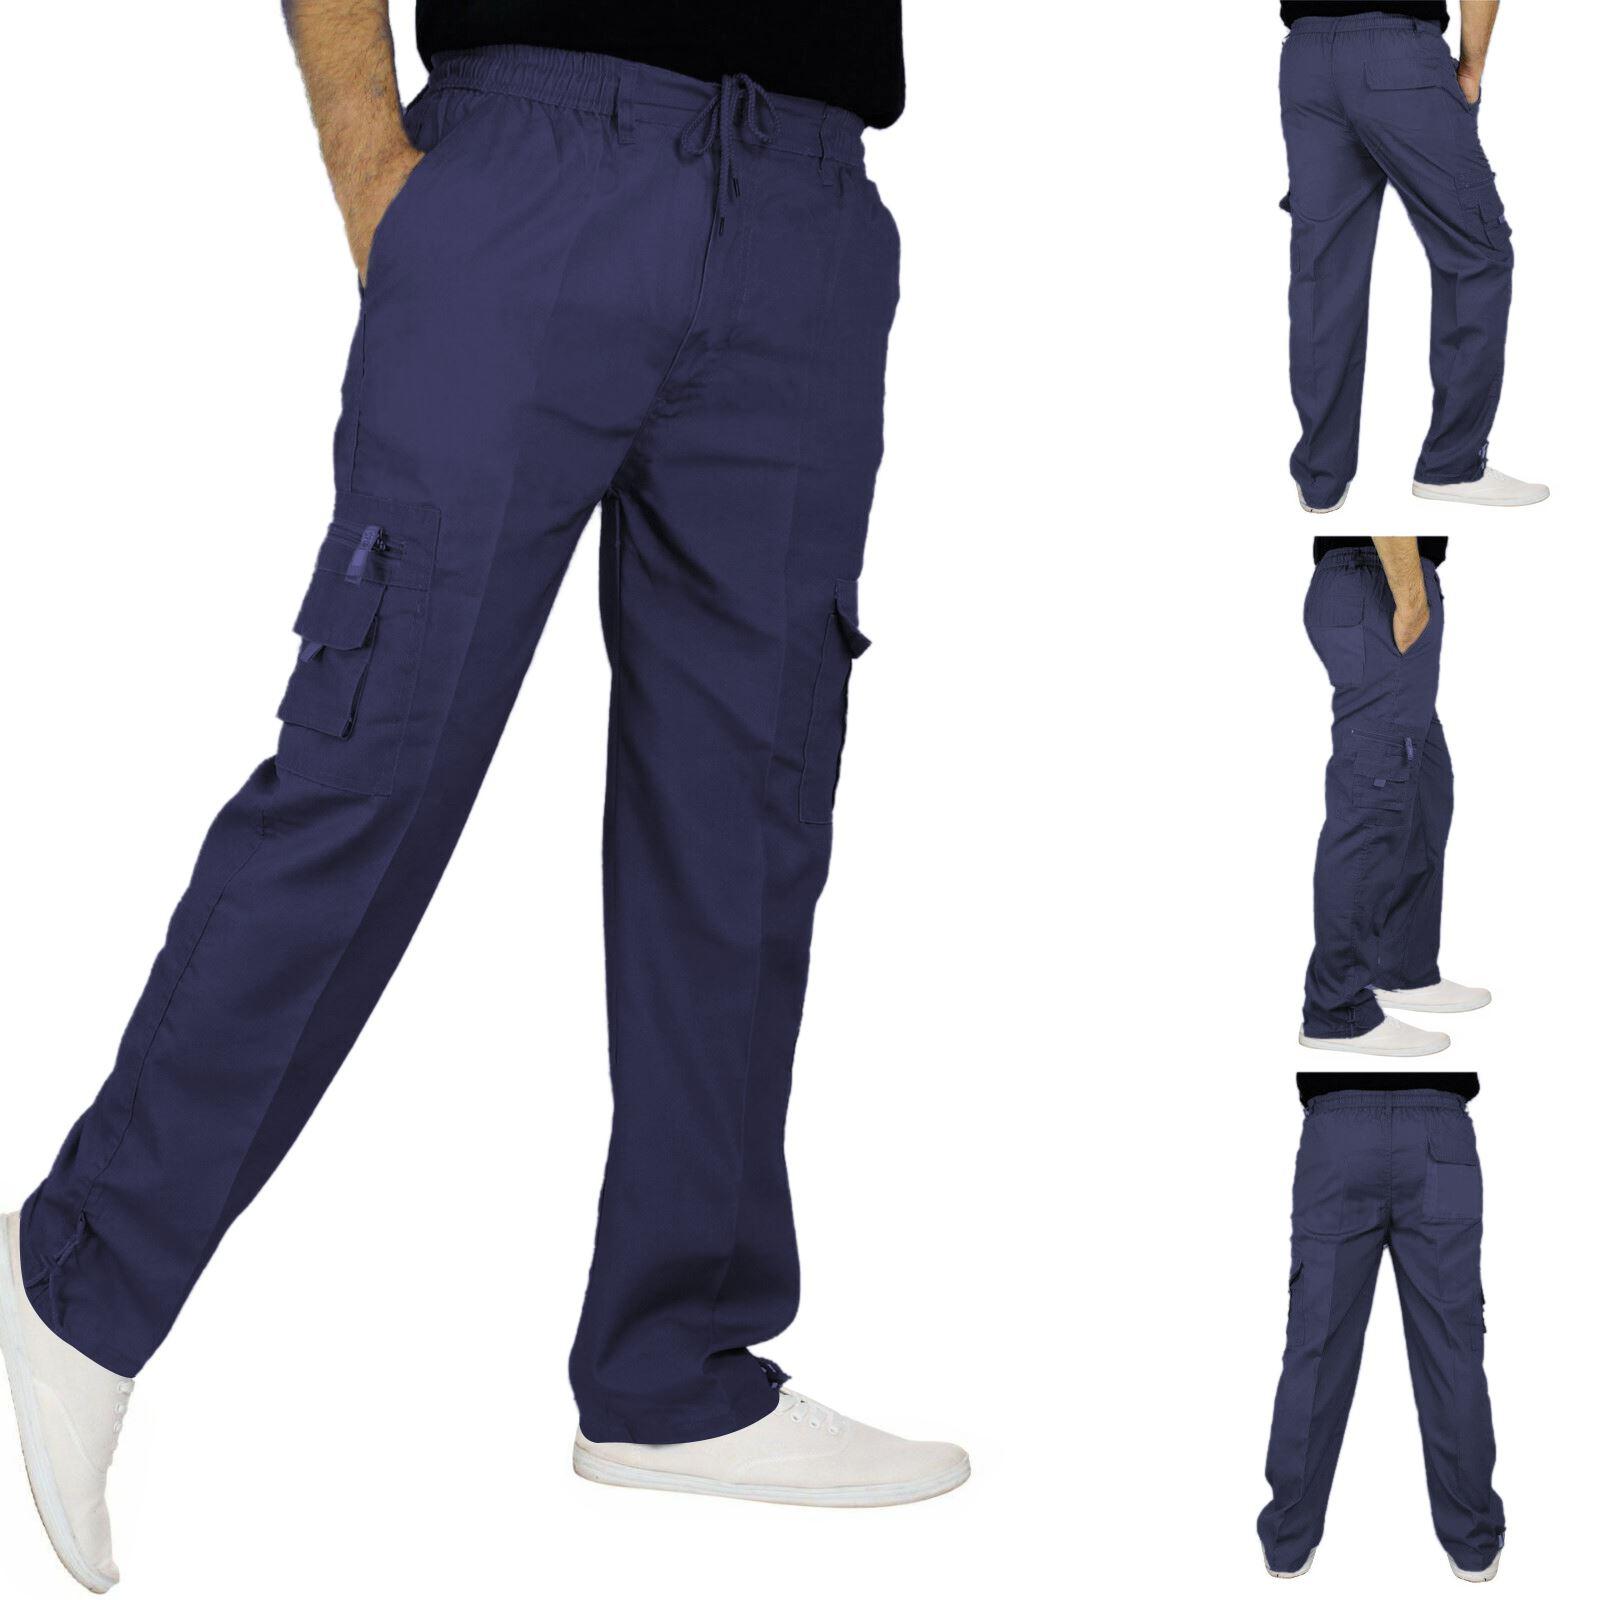 New-Mens-Lightweight-Elasticated-Cargo-Trousers-Combat-Work-Pants-Bottoms-M-XXL thumbnail 11